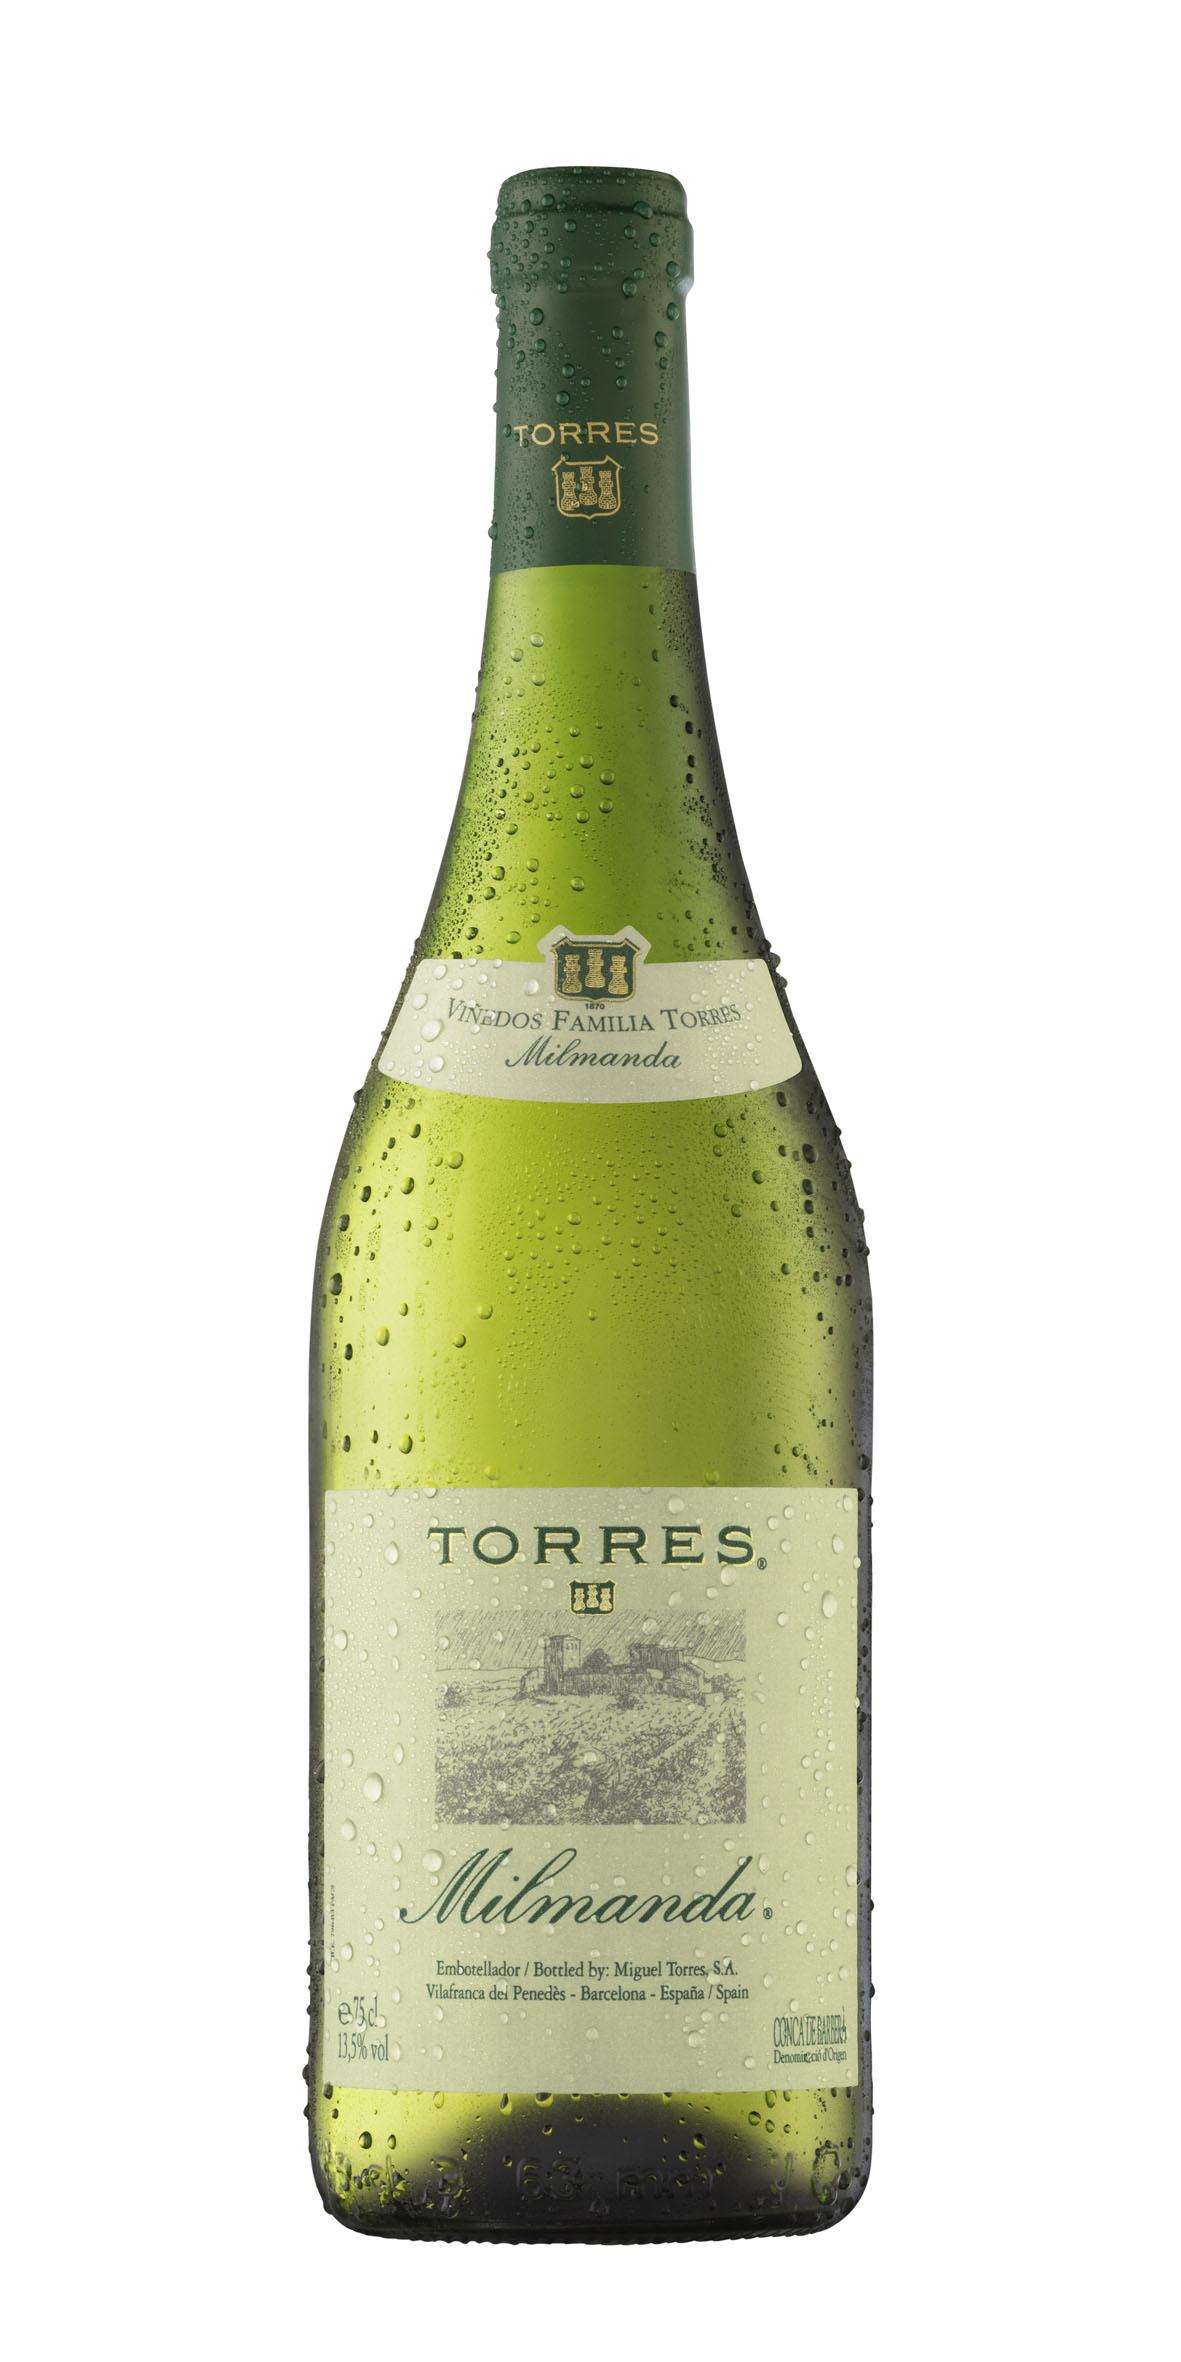 Torres milmanda 2012